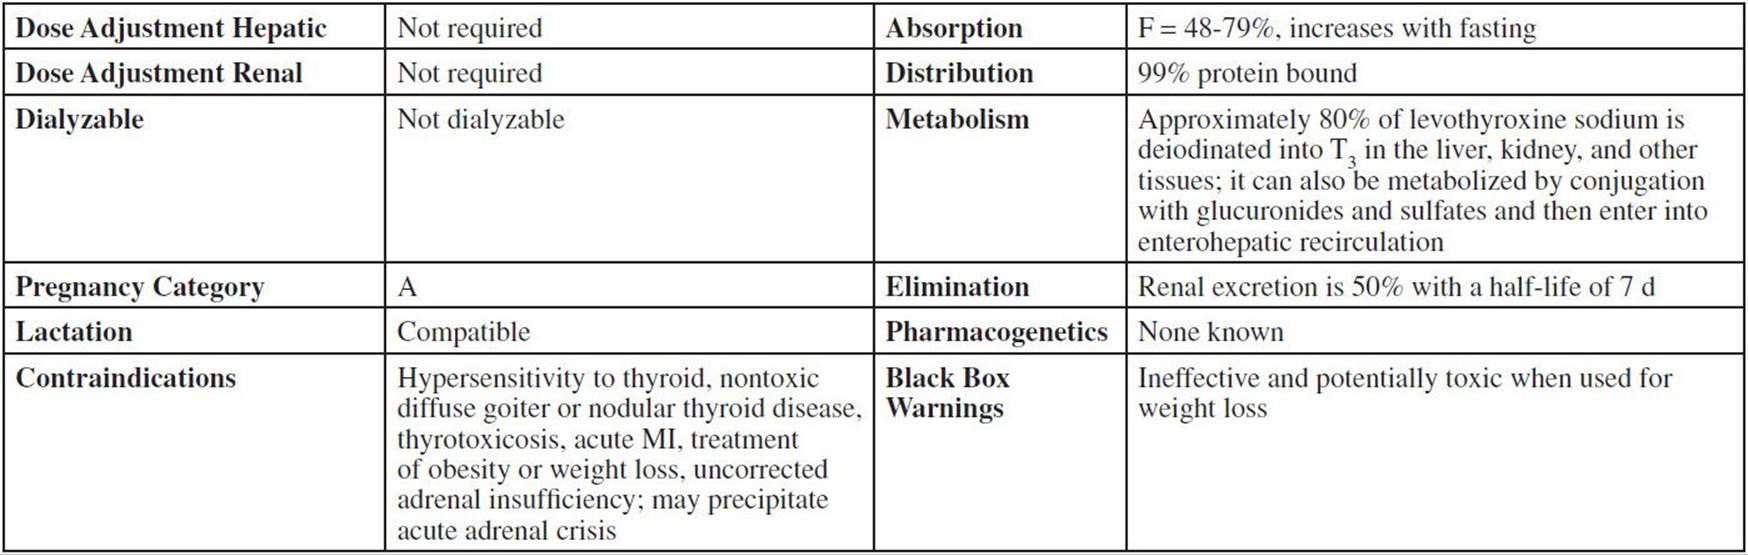 dose adjustment in renal diseases